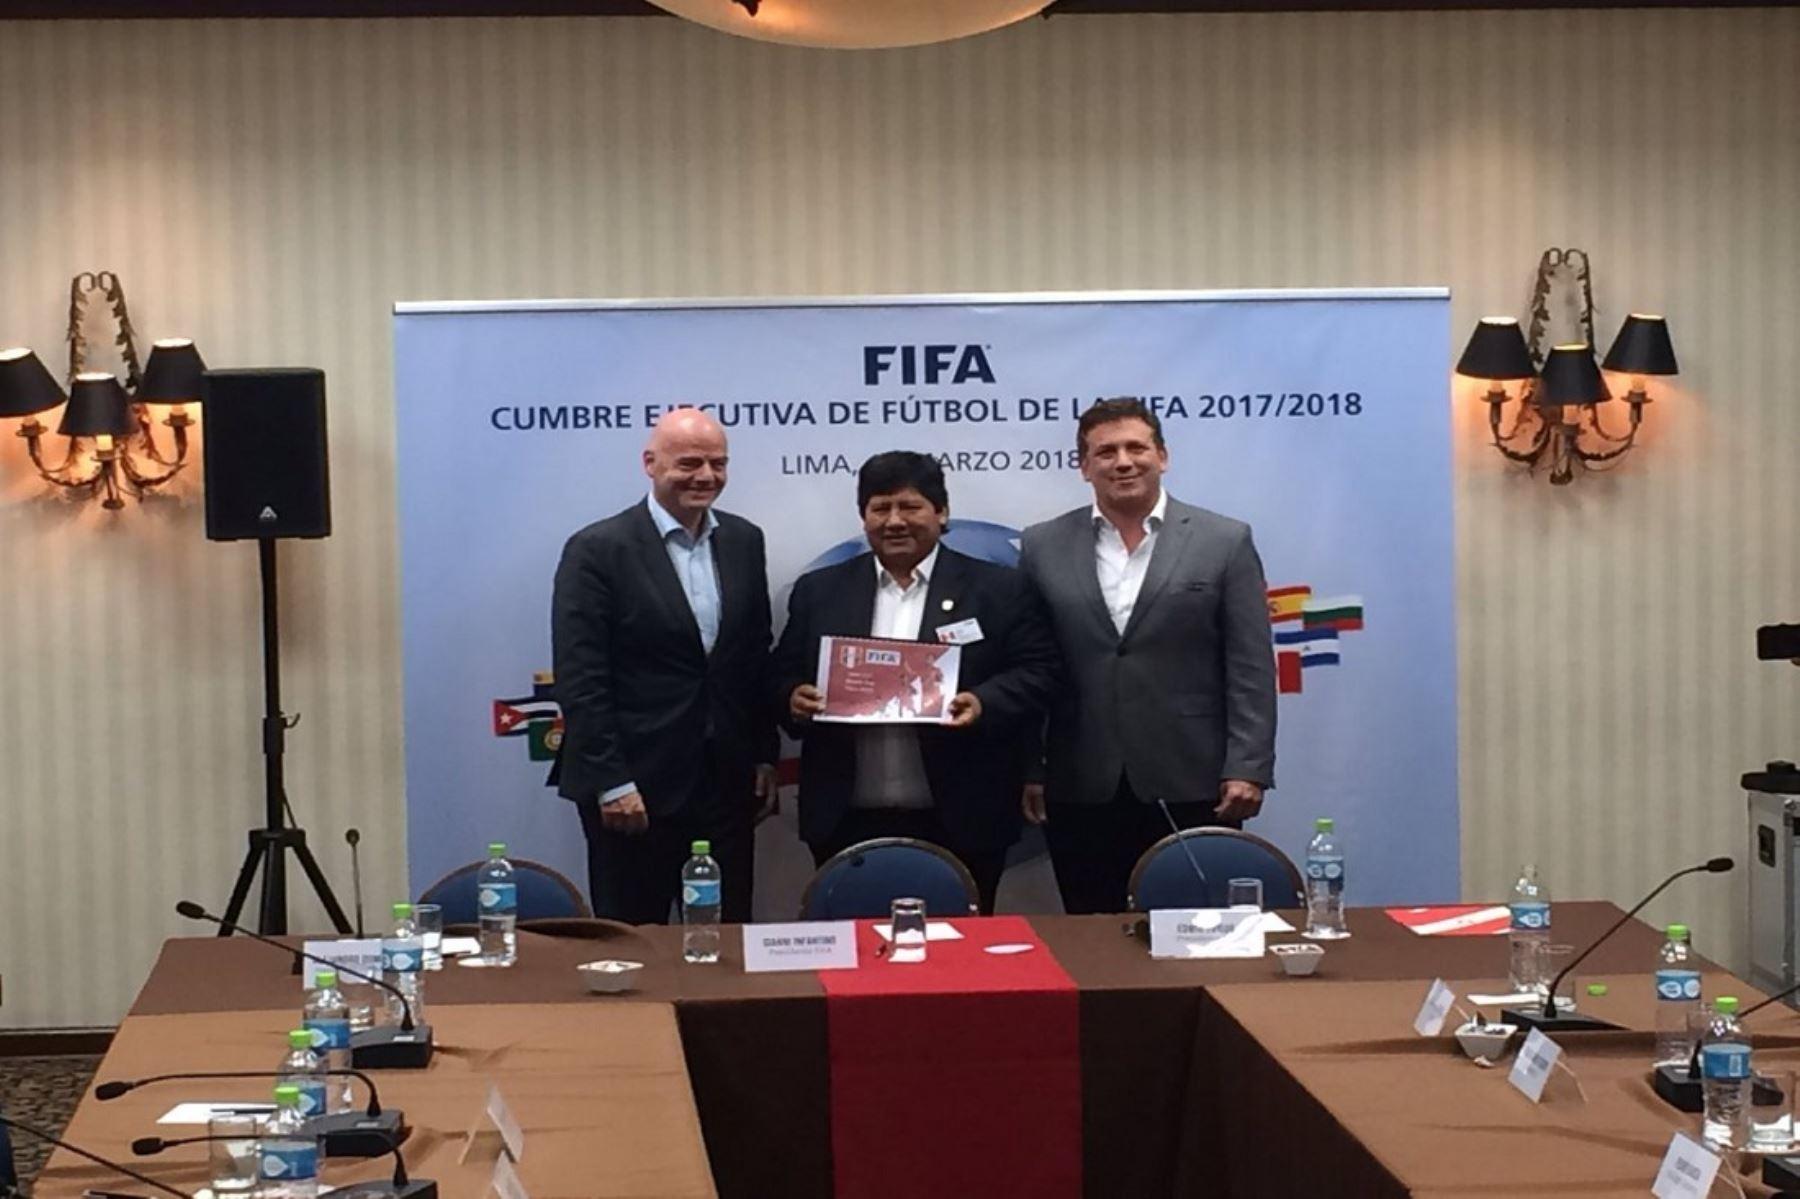 Infantino presidió la Cumbre Ejecutiva de FIFA en Lima y recibió la candidatura de Perú como sede del Mundial Sub17 2019